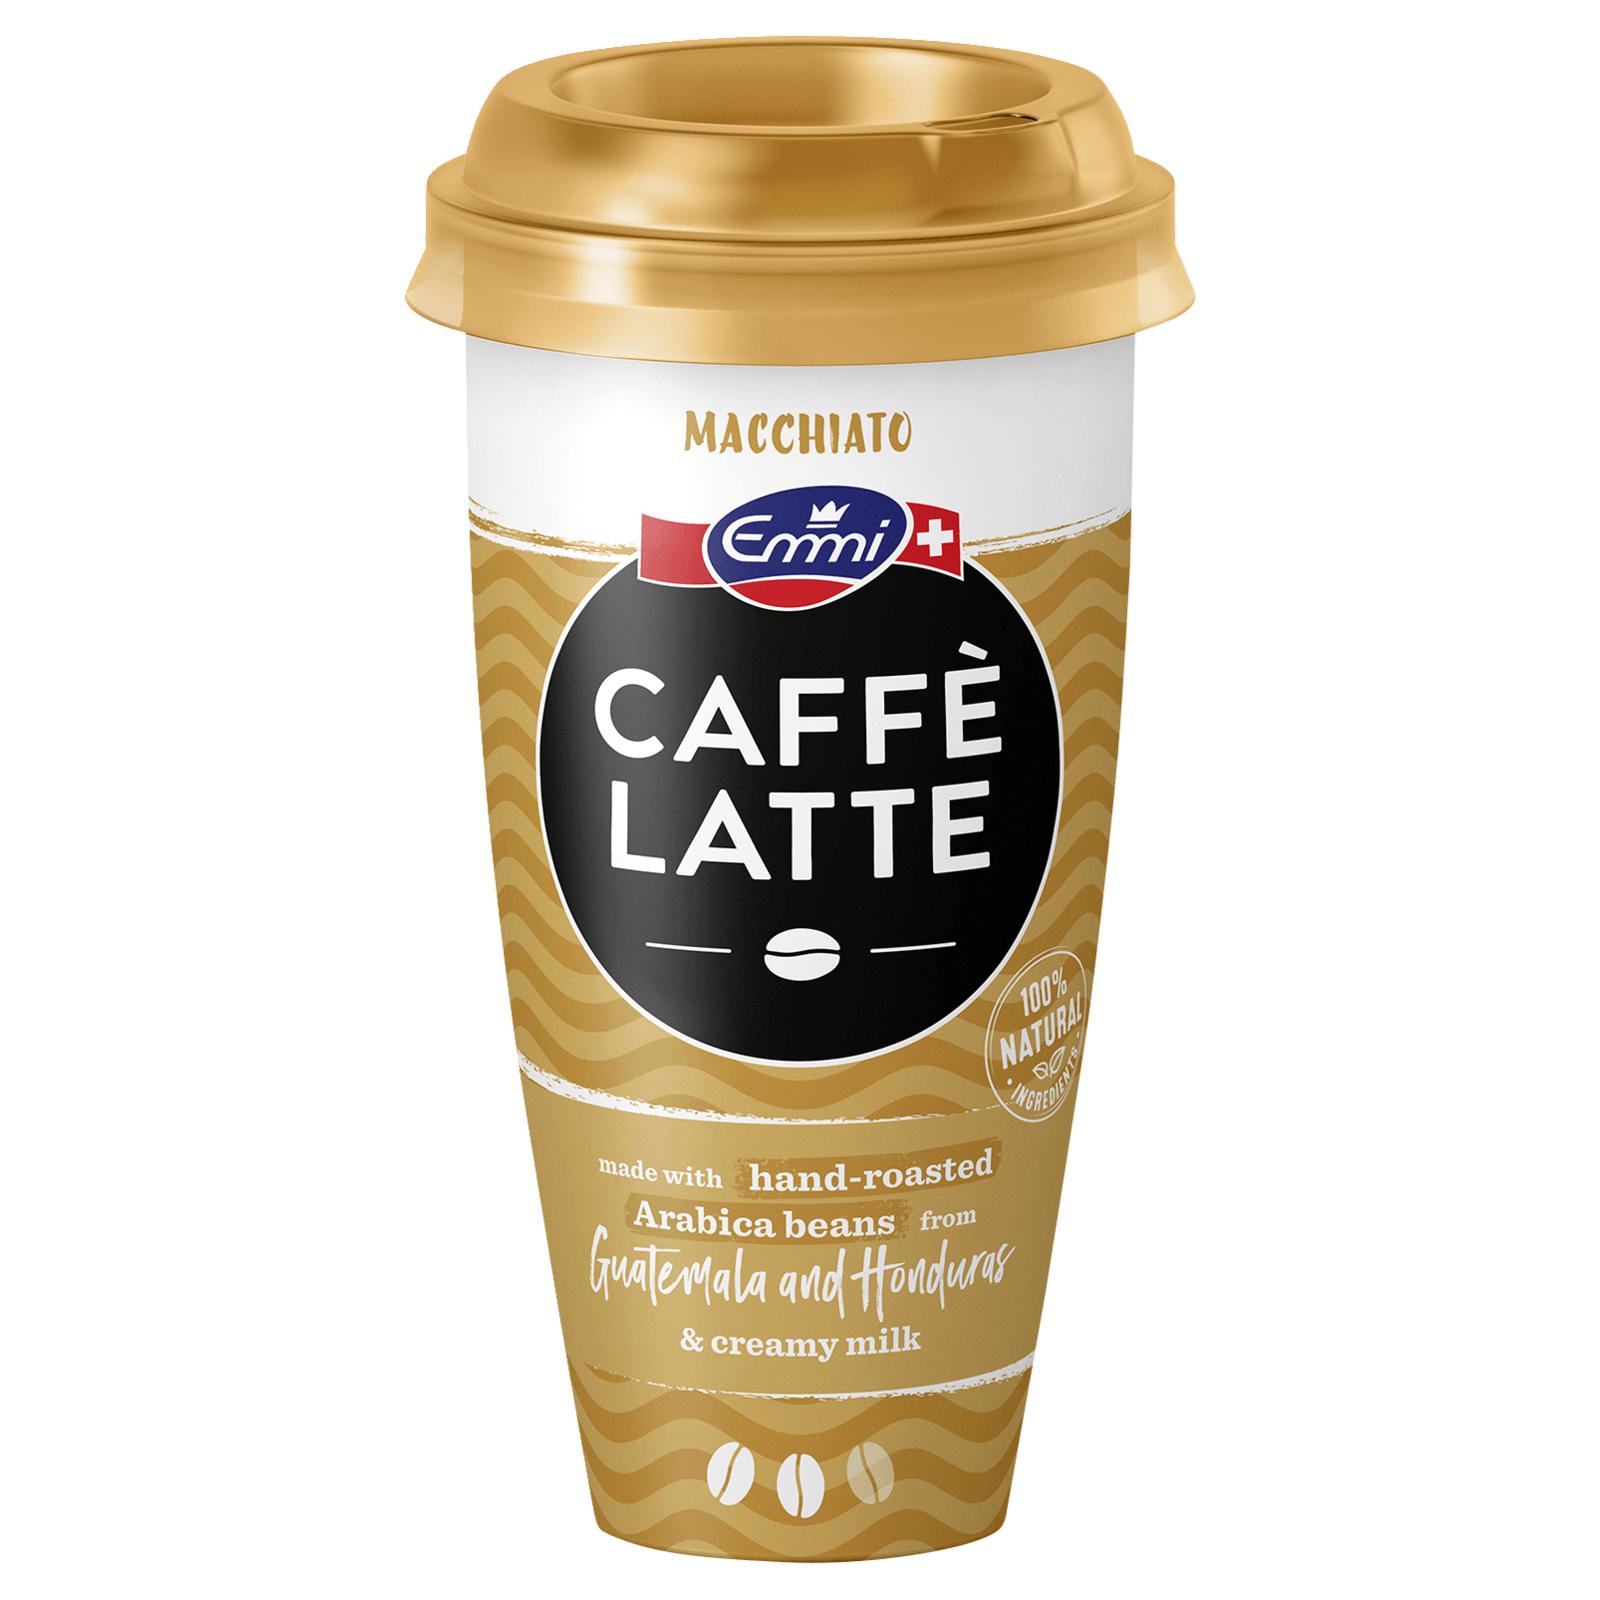 REWE Emmi Latte Cafe